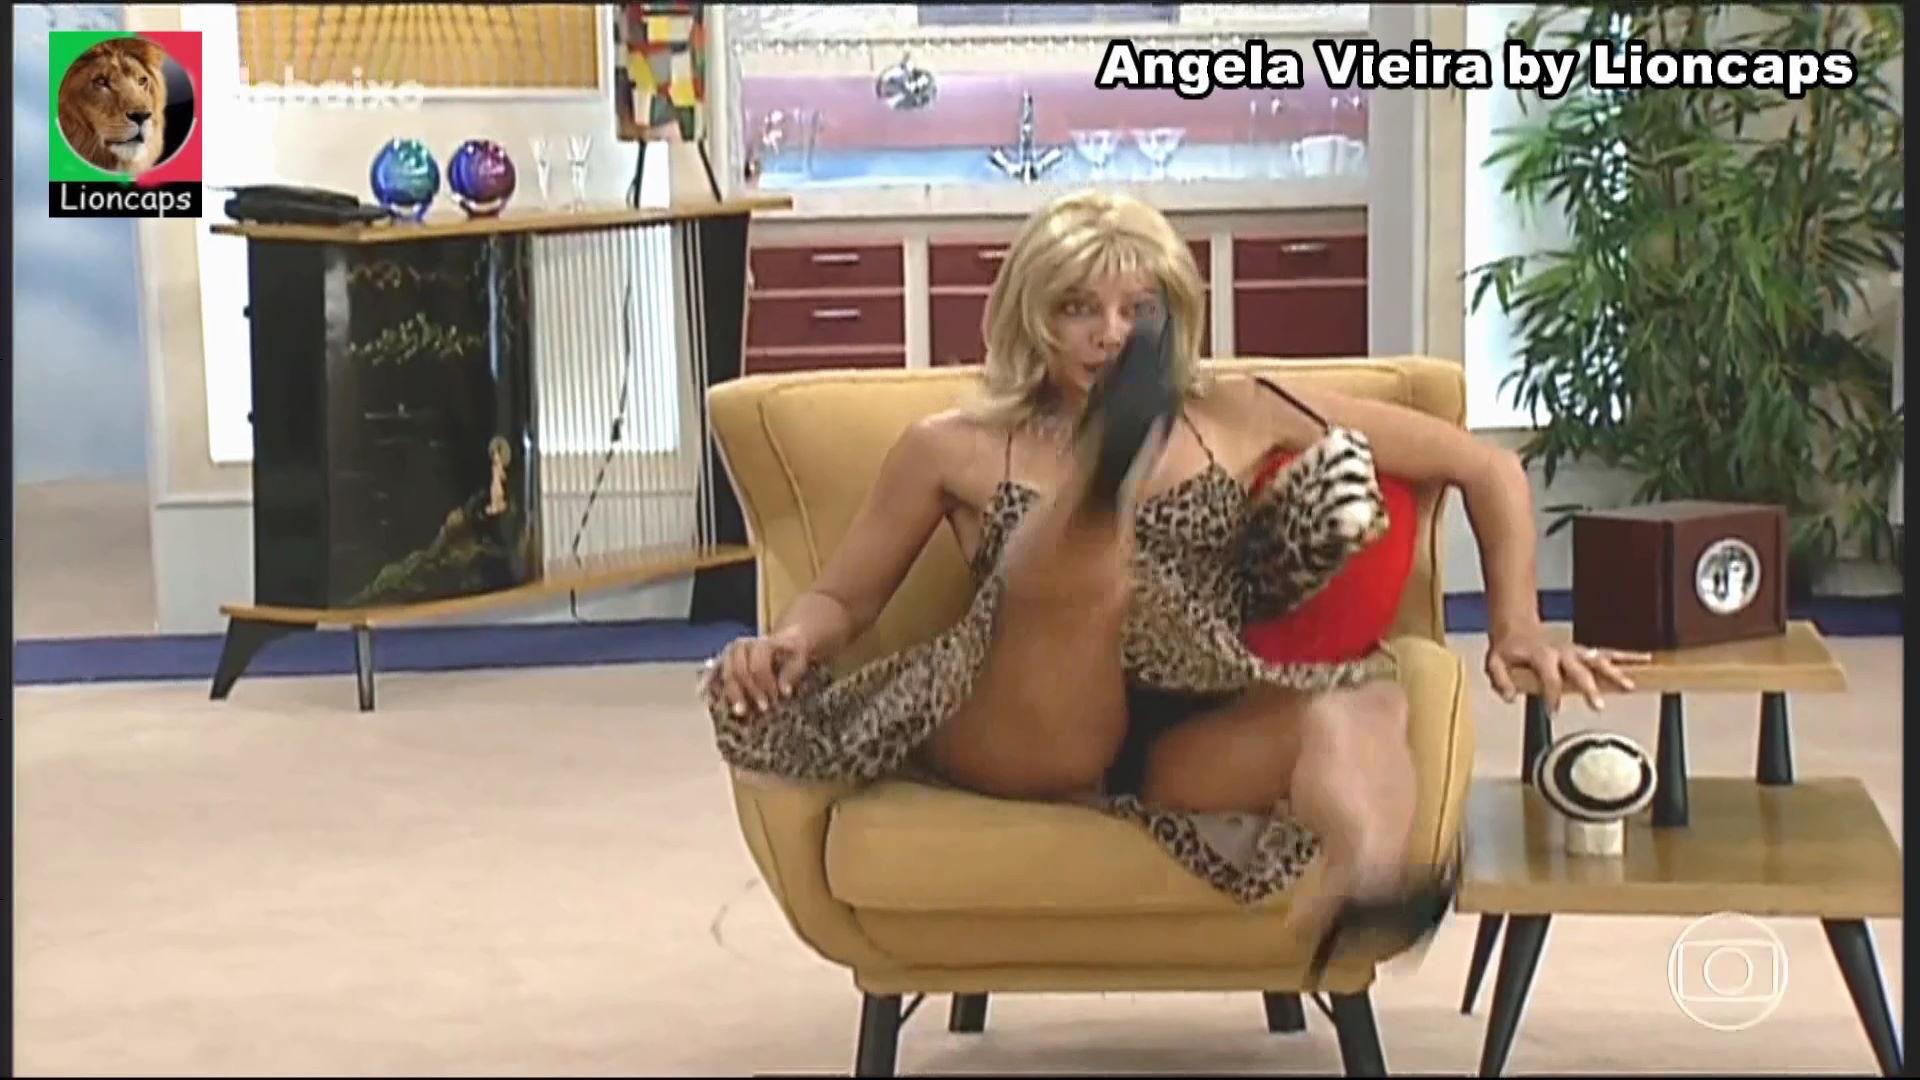 859663449_angela_vieira_vs190514_0459_122_534lo.JPG